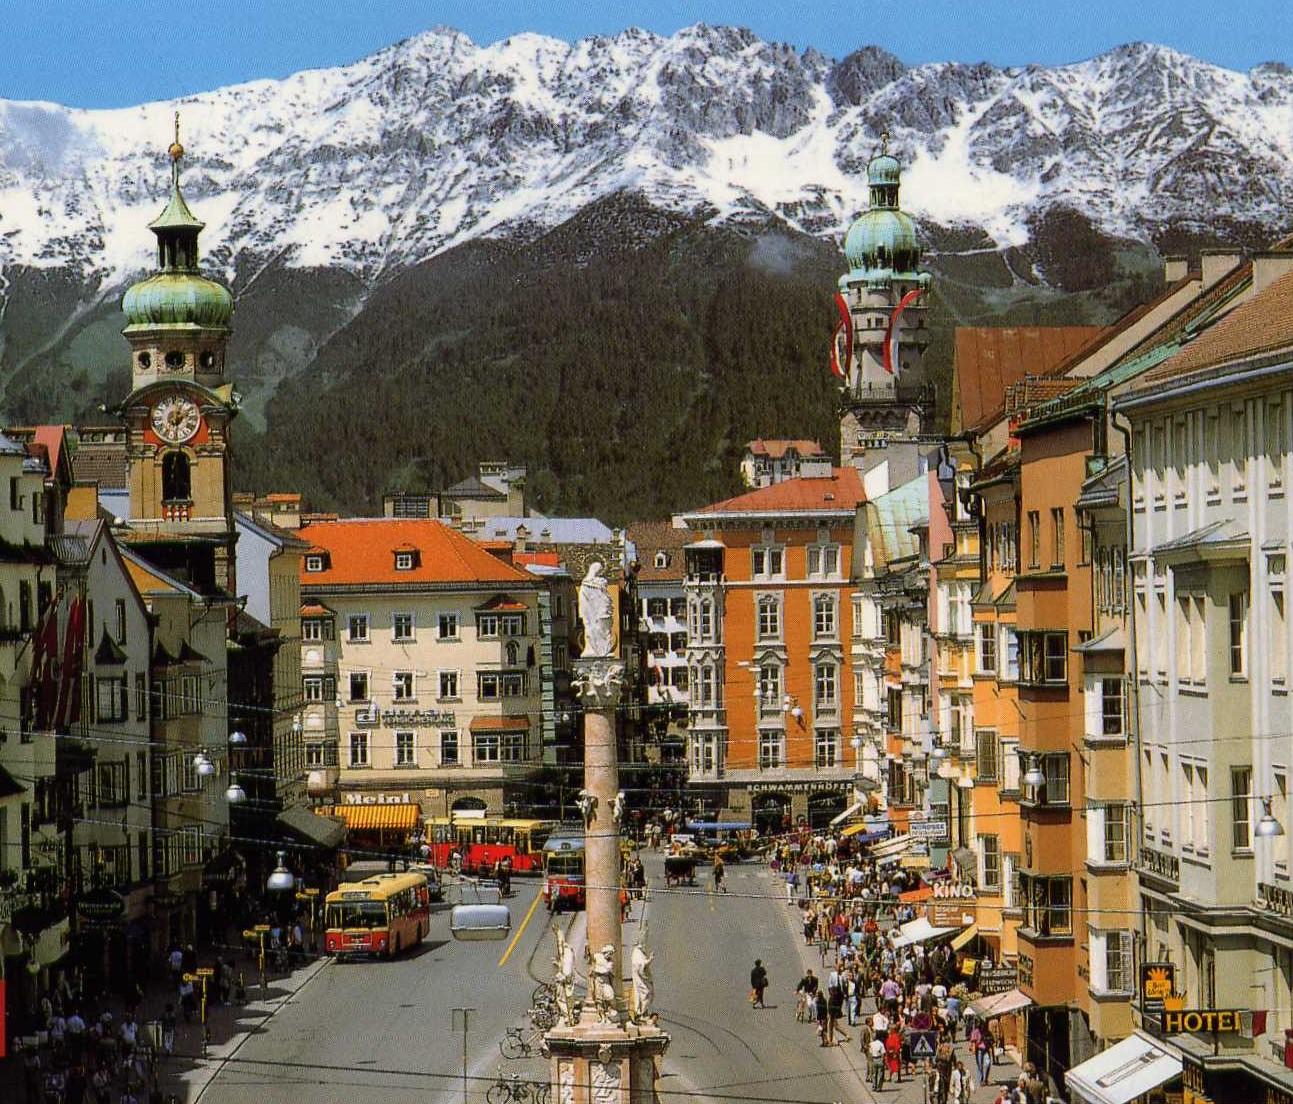 Posted in: Austria , Europe , Innsbruck , Winter Vacations: mahdollinentie.blogspot.com/2011/11/innsbruck-austria.html